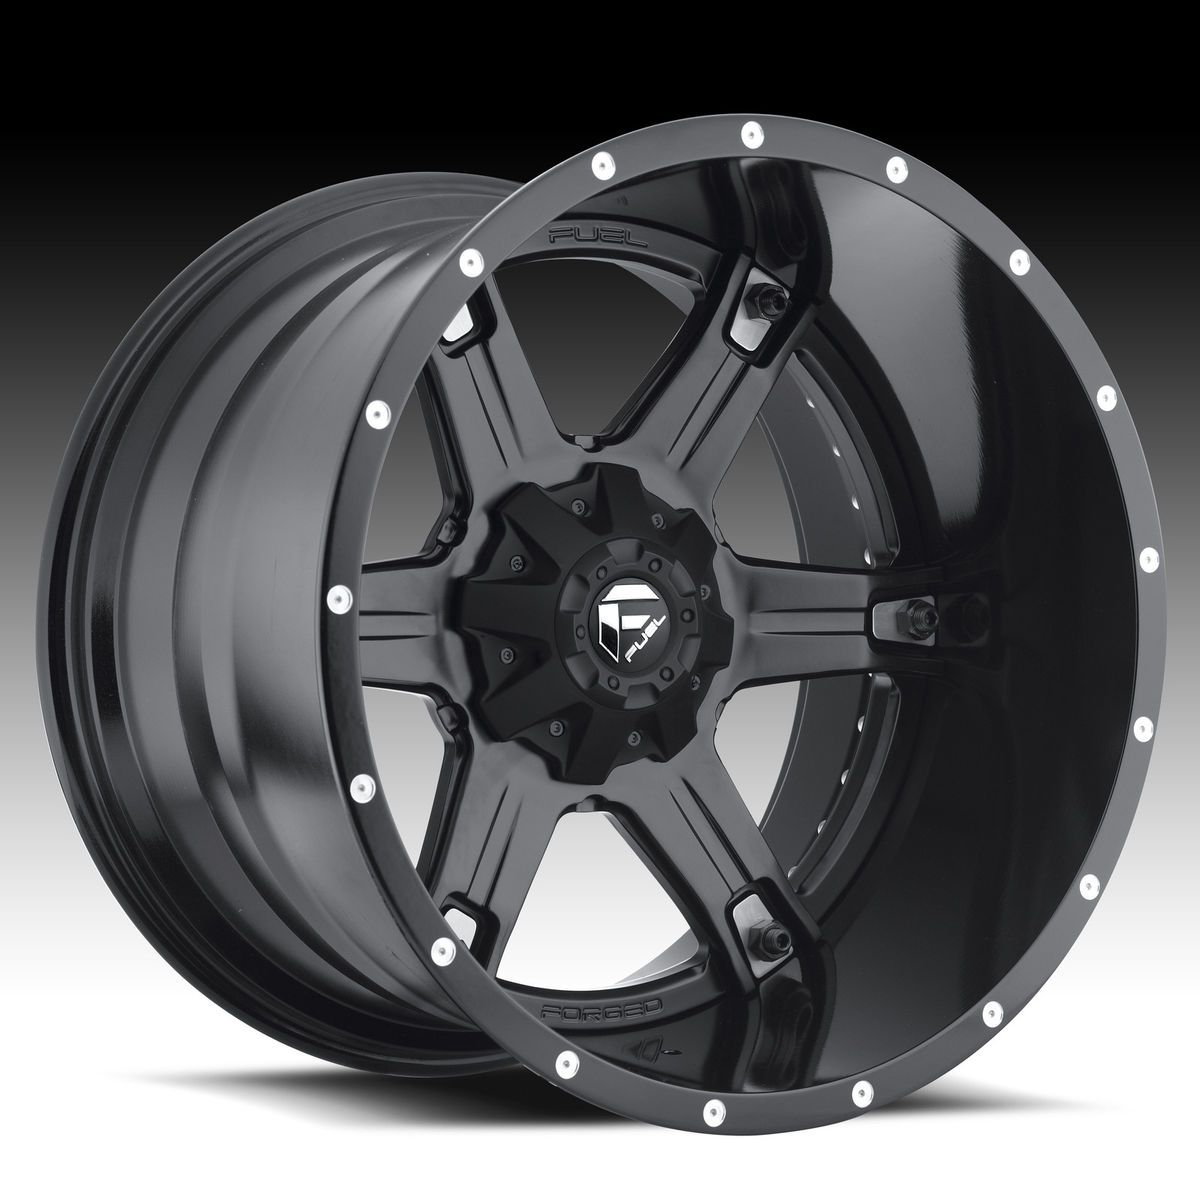 Driller 2pc Wheel Set Black 20x9 Rims Ford Chevy Dodge Wheels